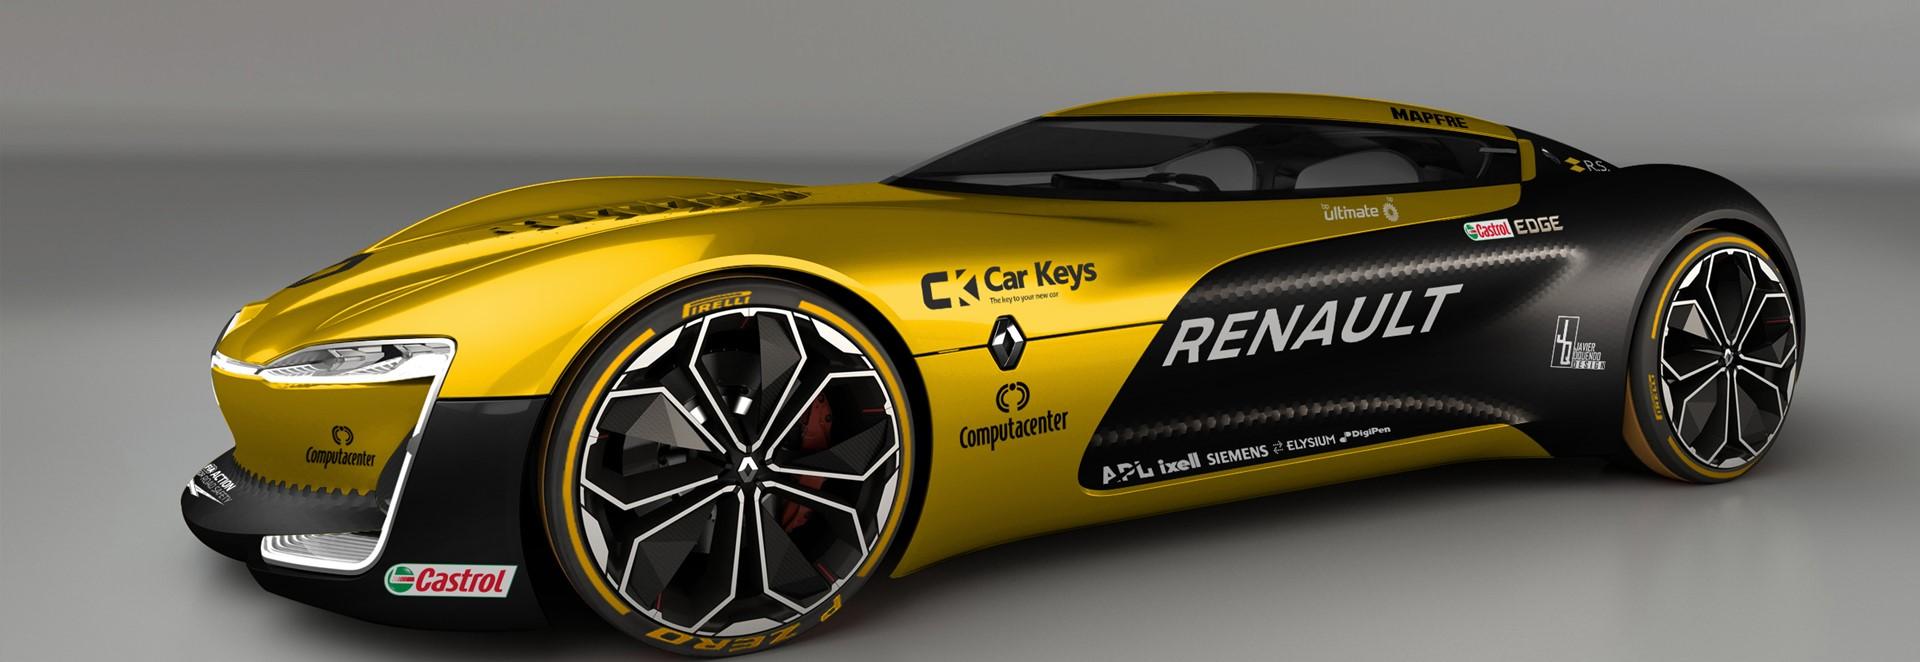 Liveries On Supercars Part Car Keys